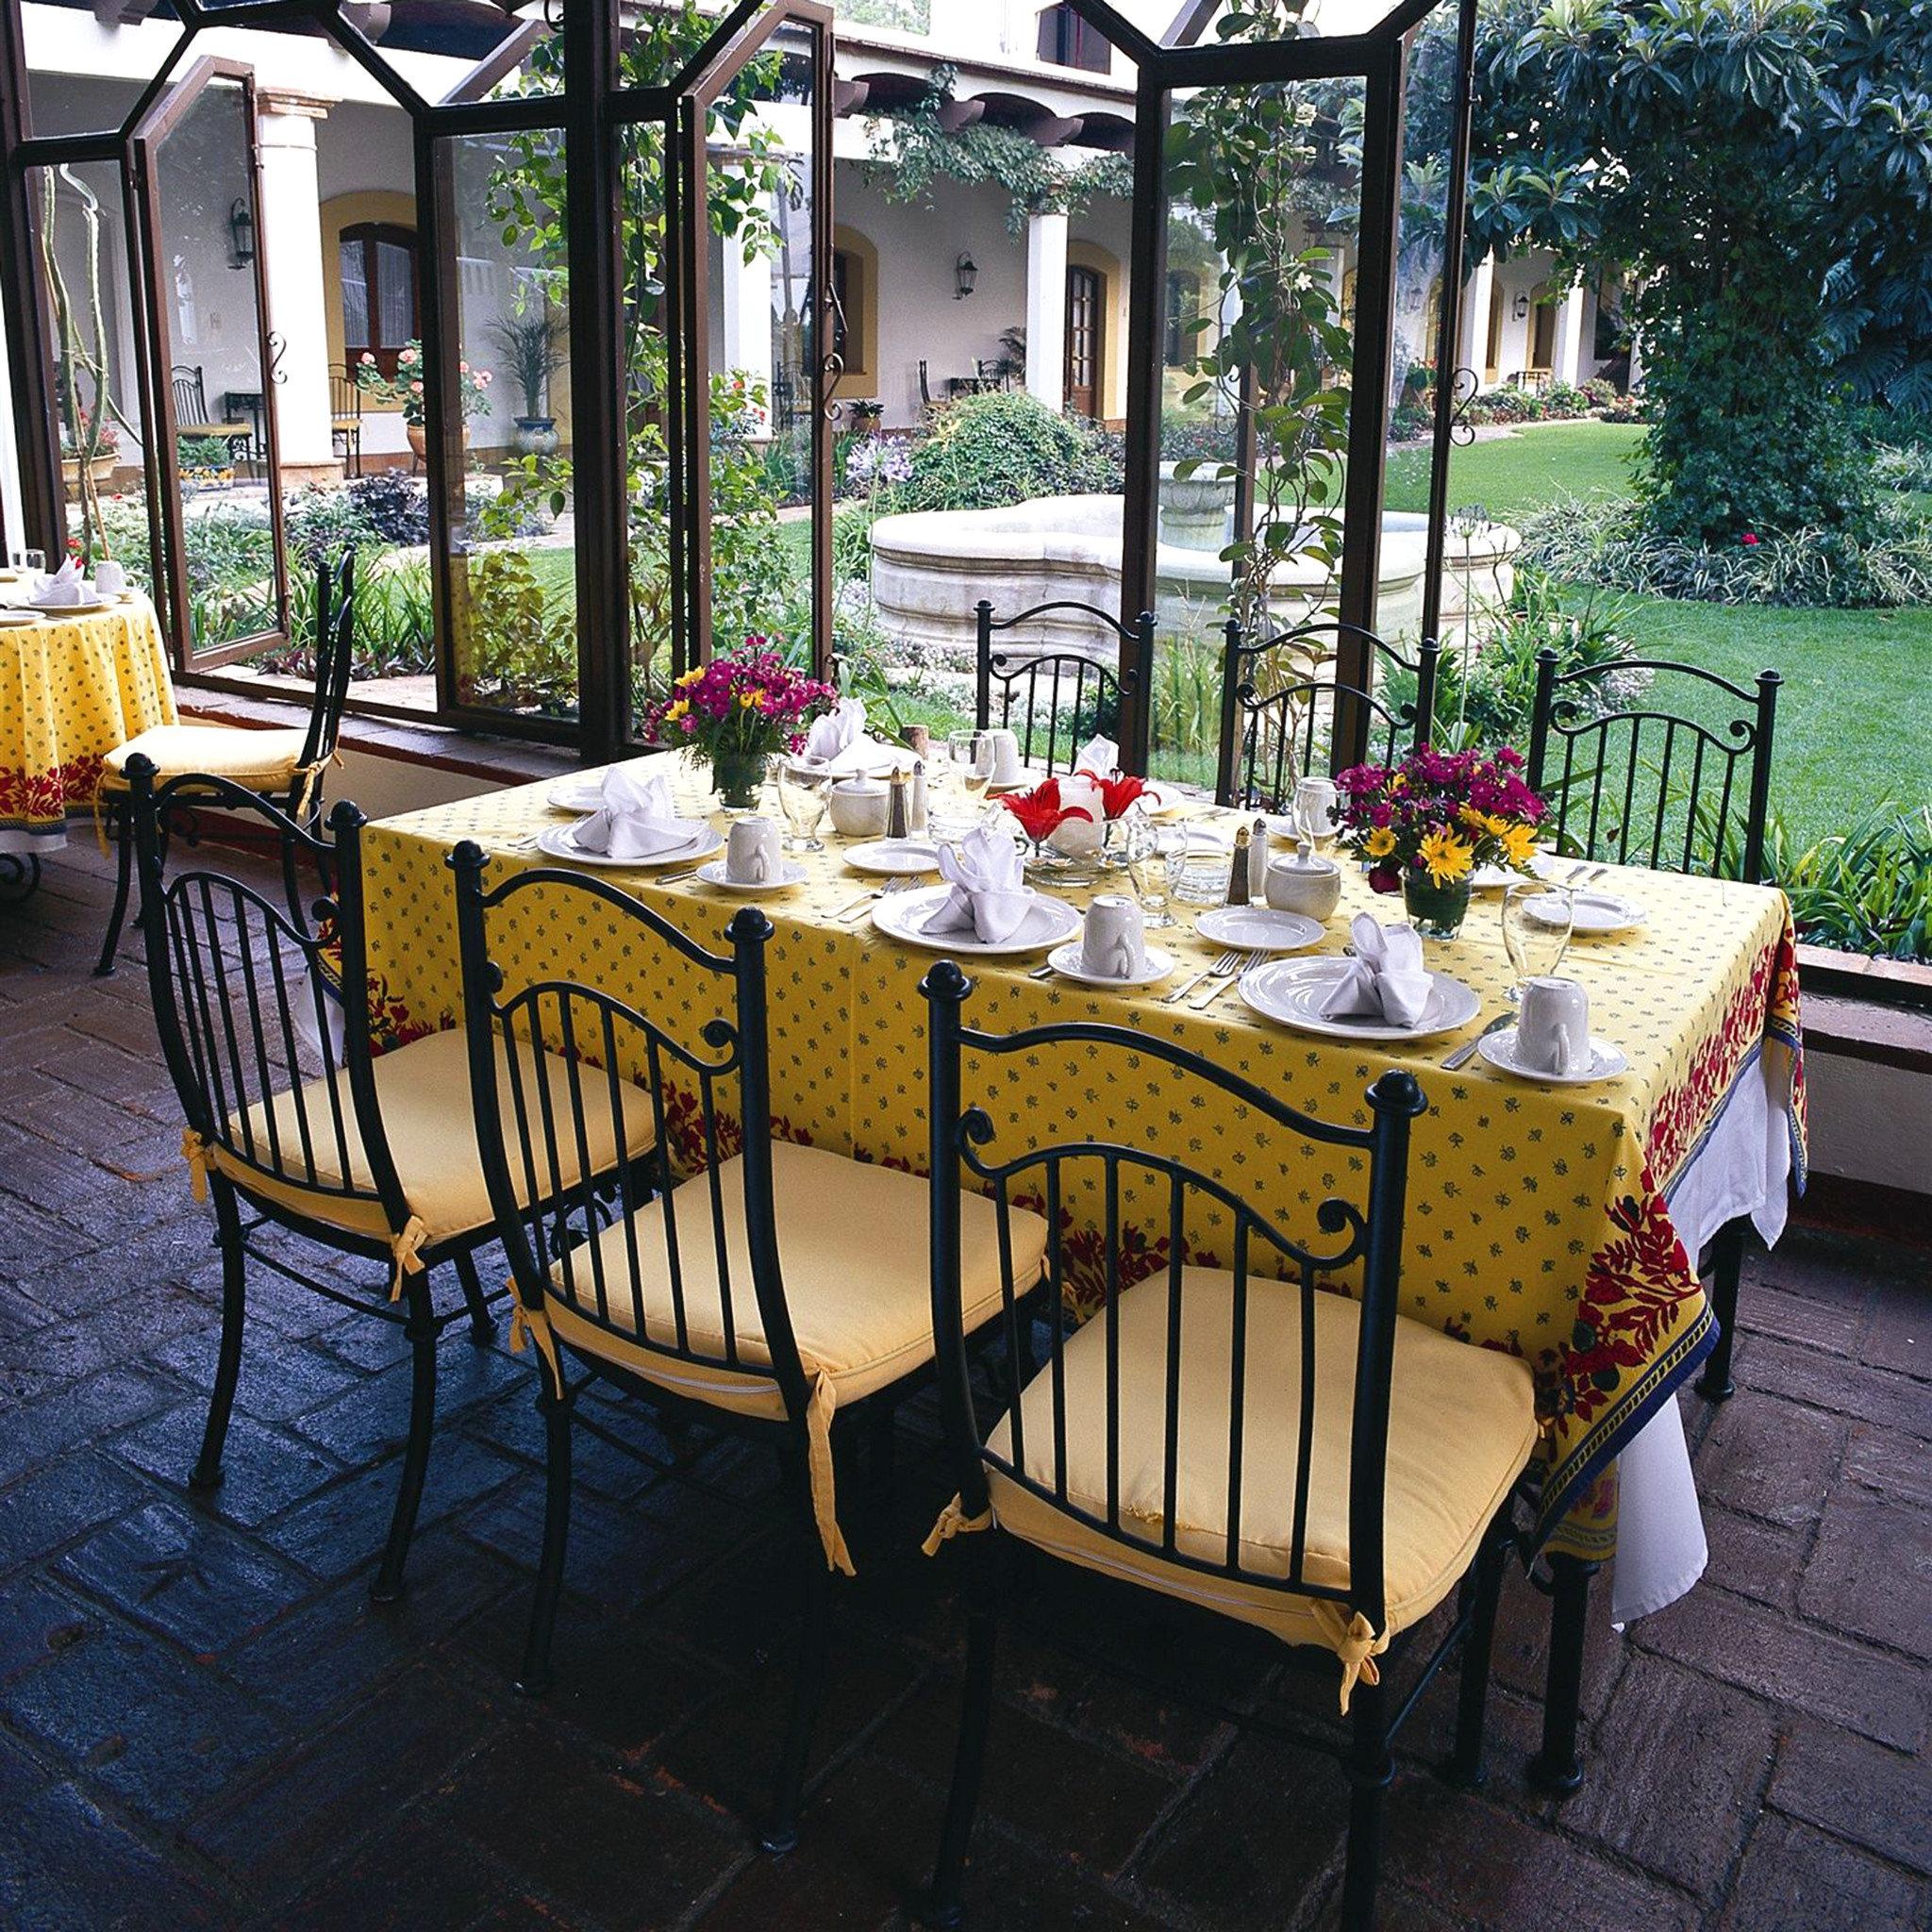 Courtyard Dining Drink Eat Outdoors Patio Terrace chair restaurant backyard flower outdoor structure porch